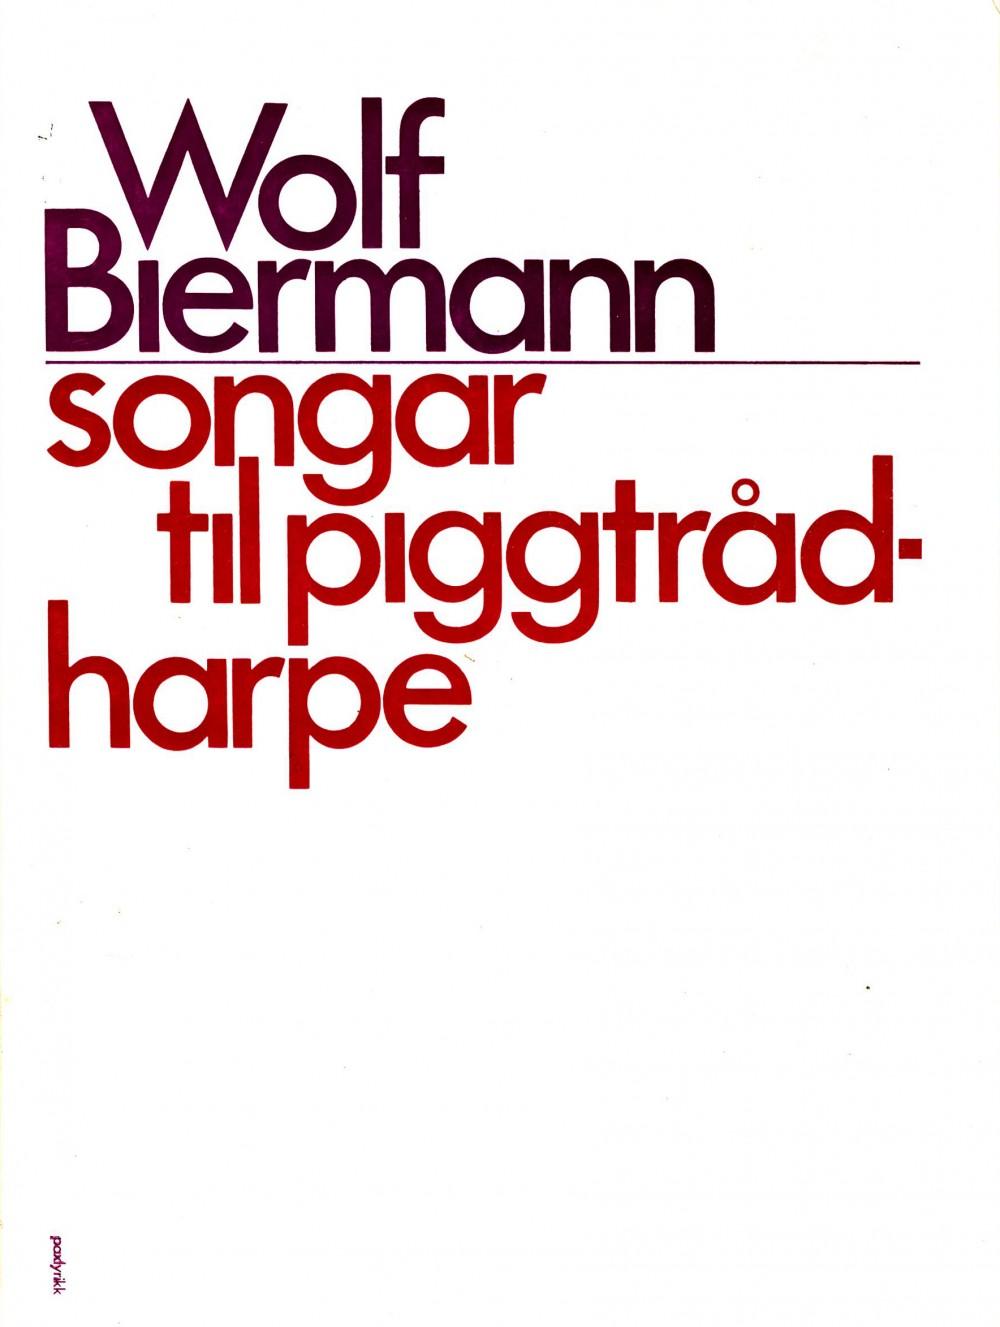 Wolf Biermann: Songar til piggtrådharpe